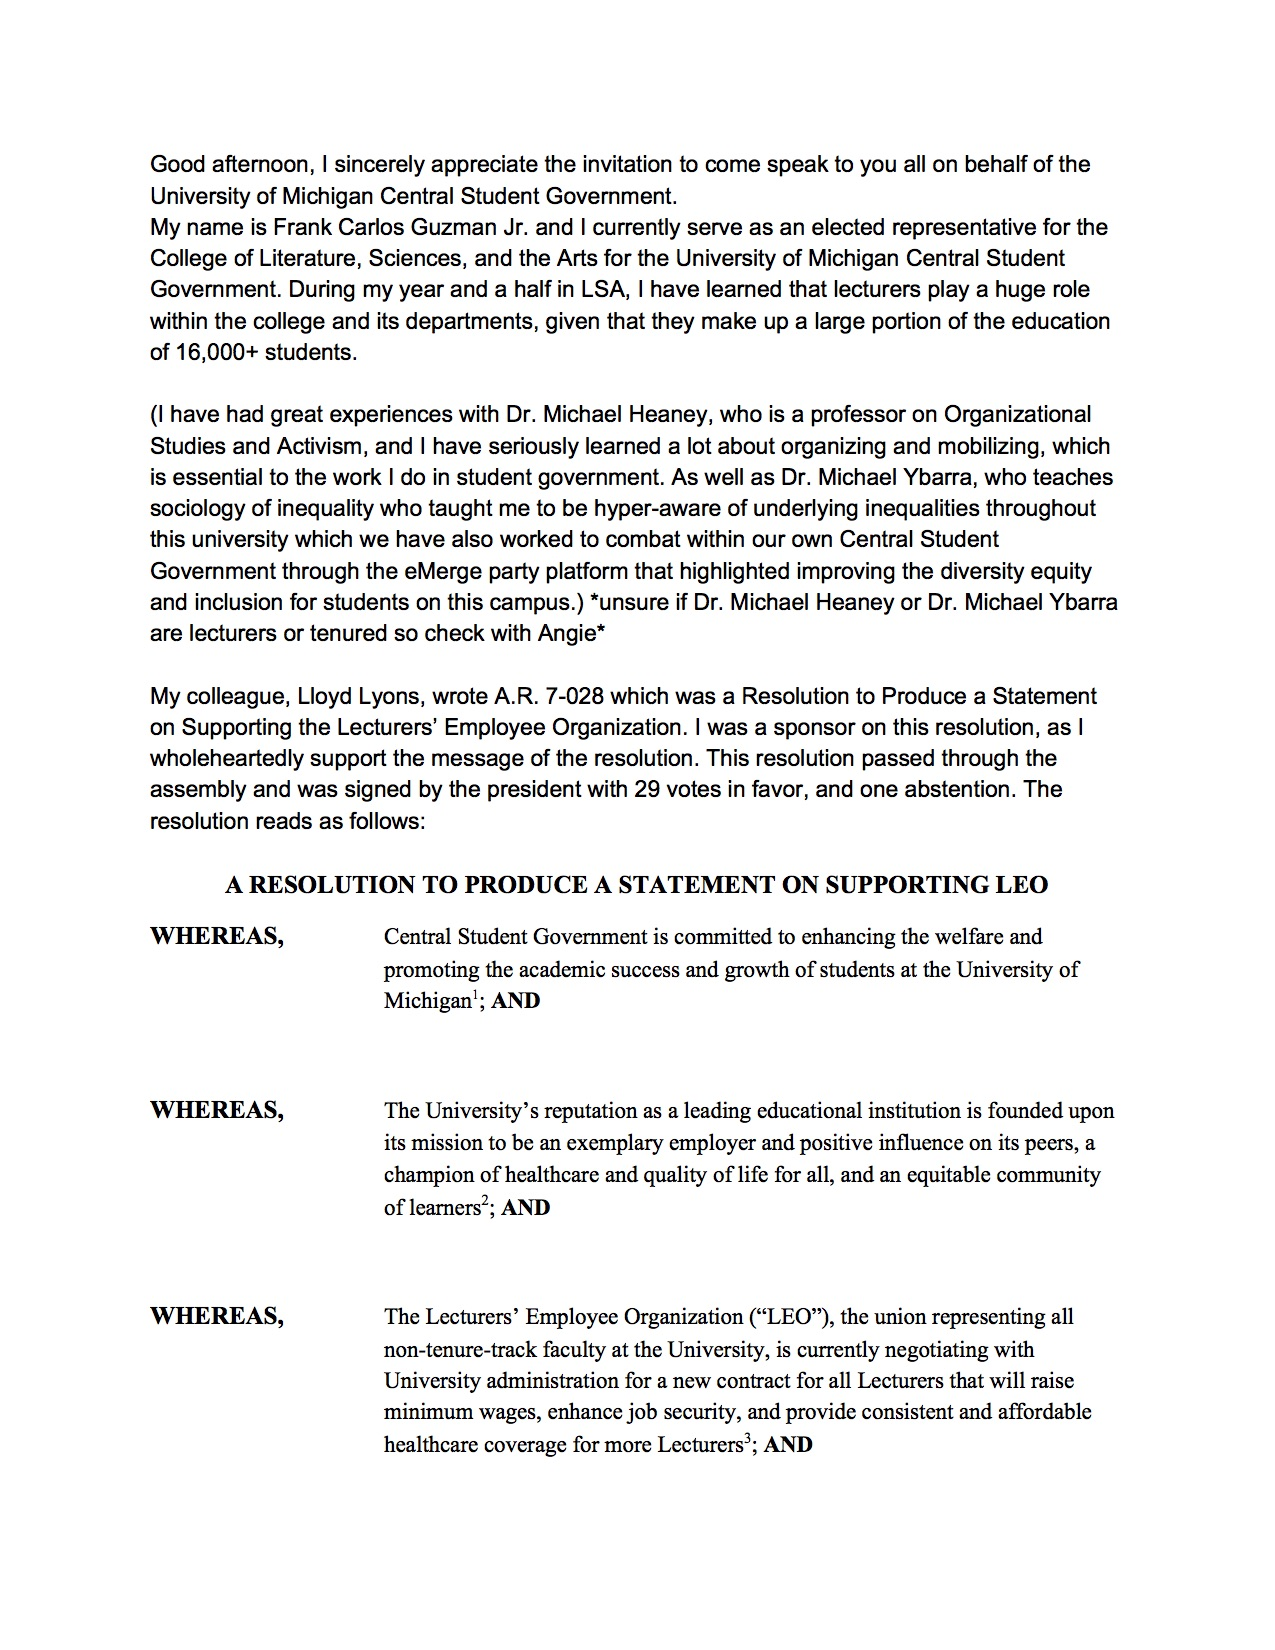 leo-speech-1.jpg